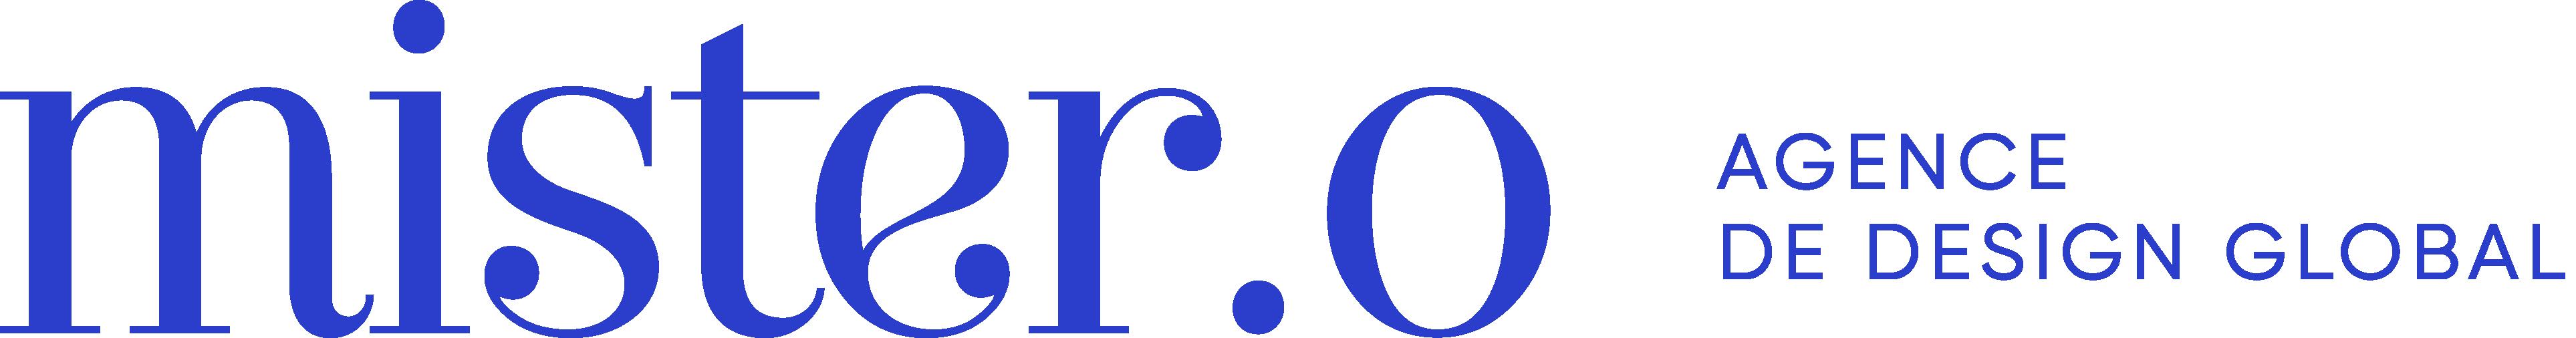 Mister-O - Agence de design global